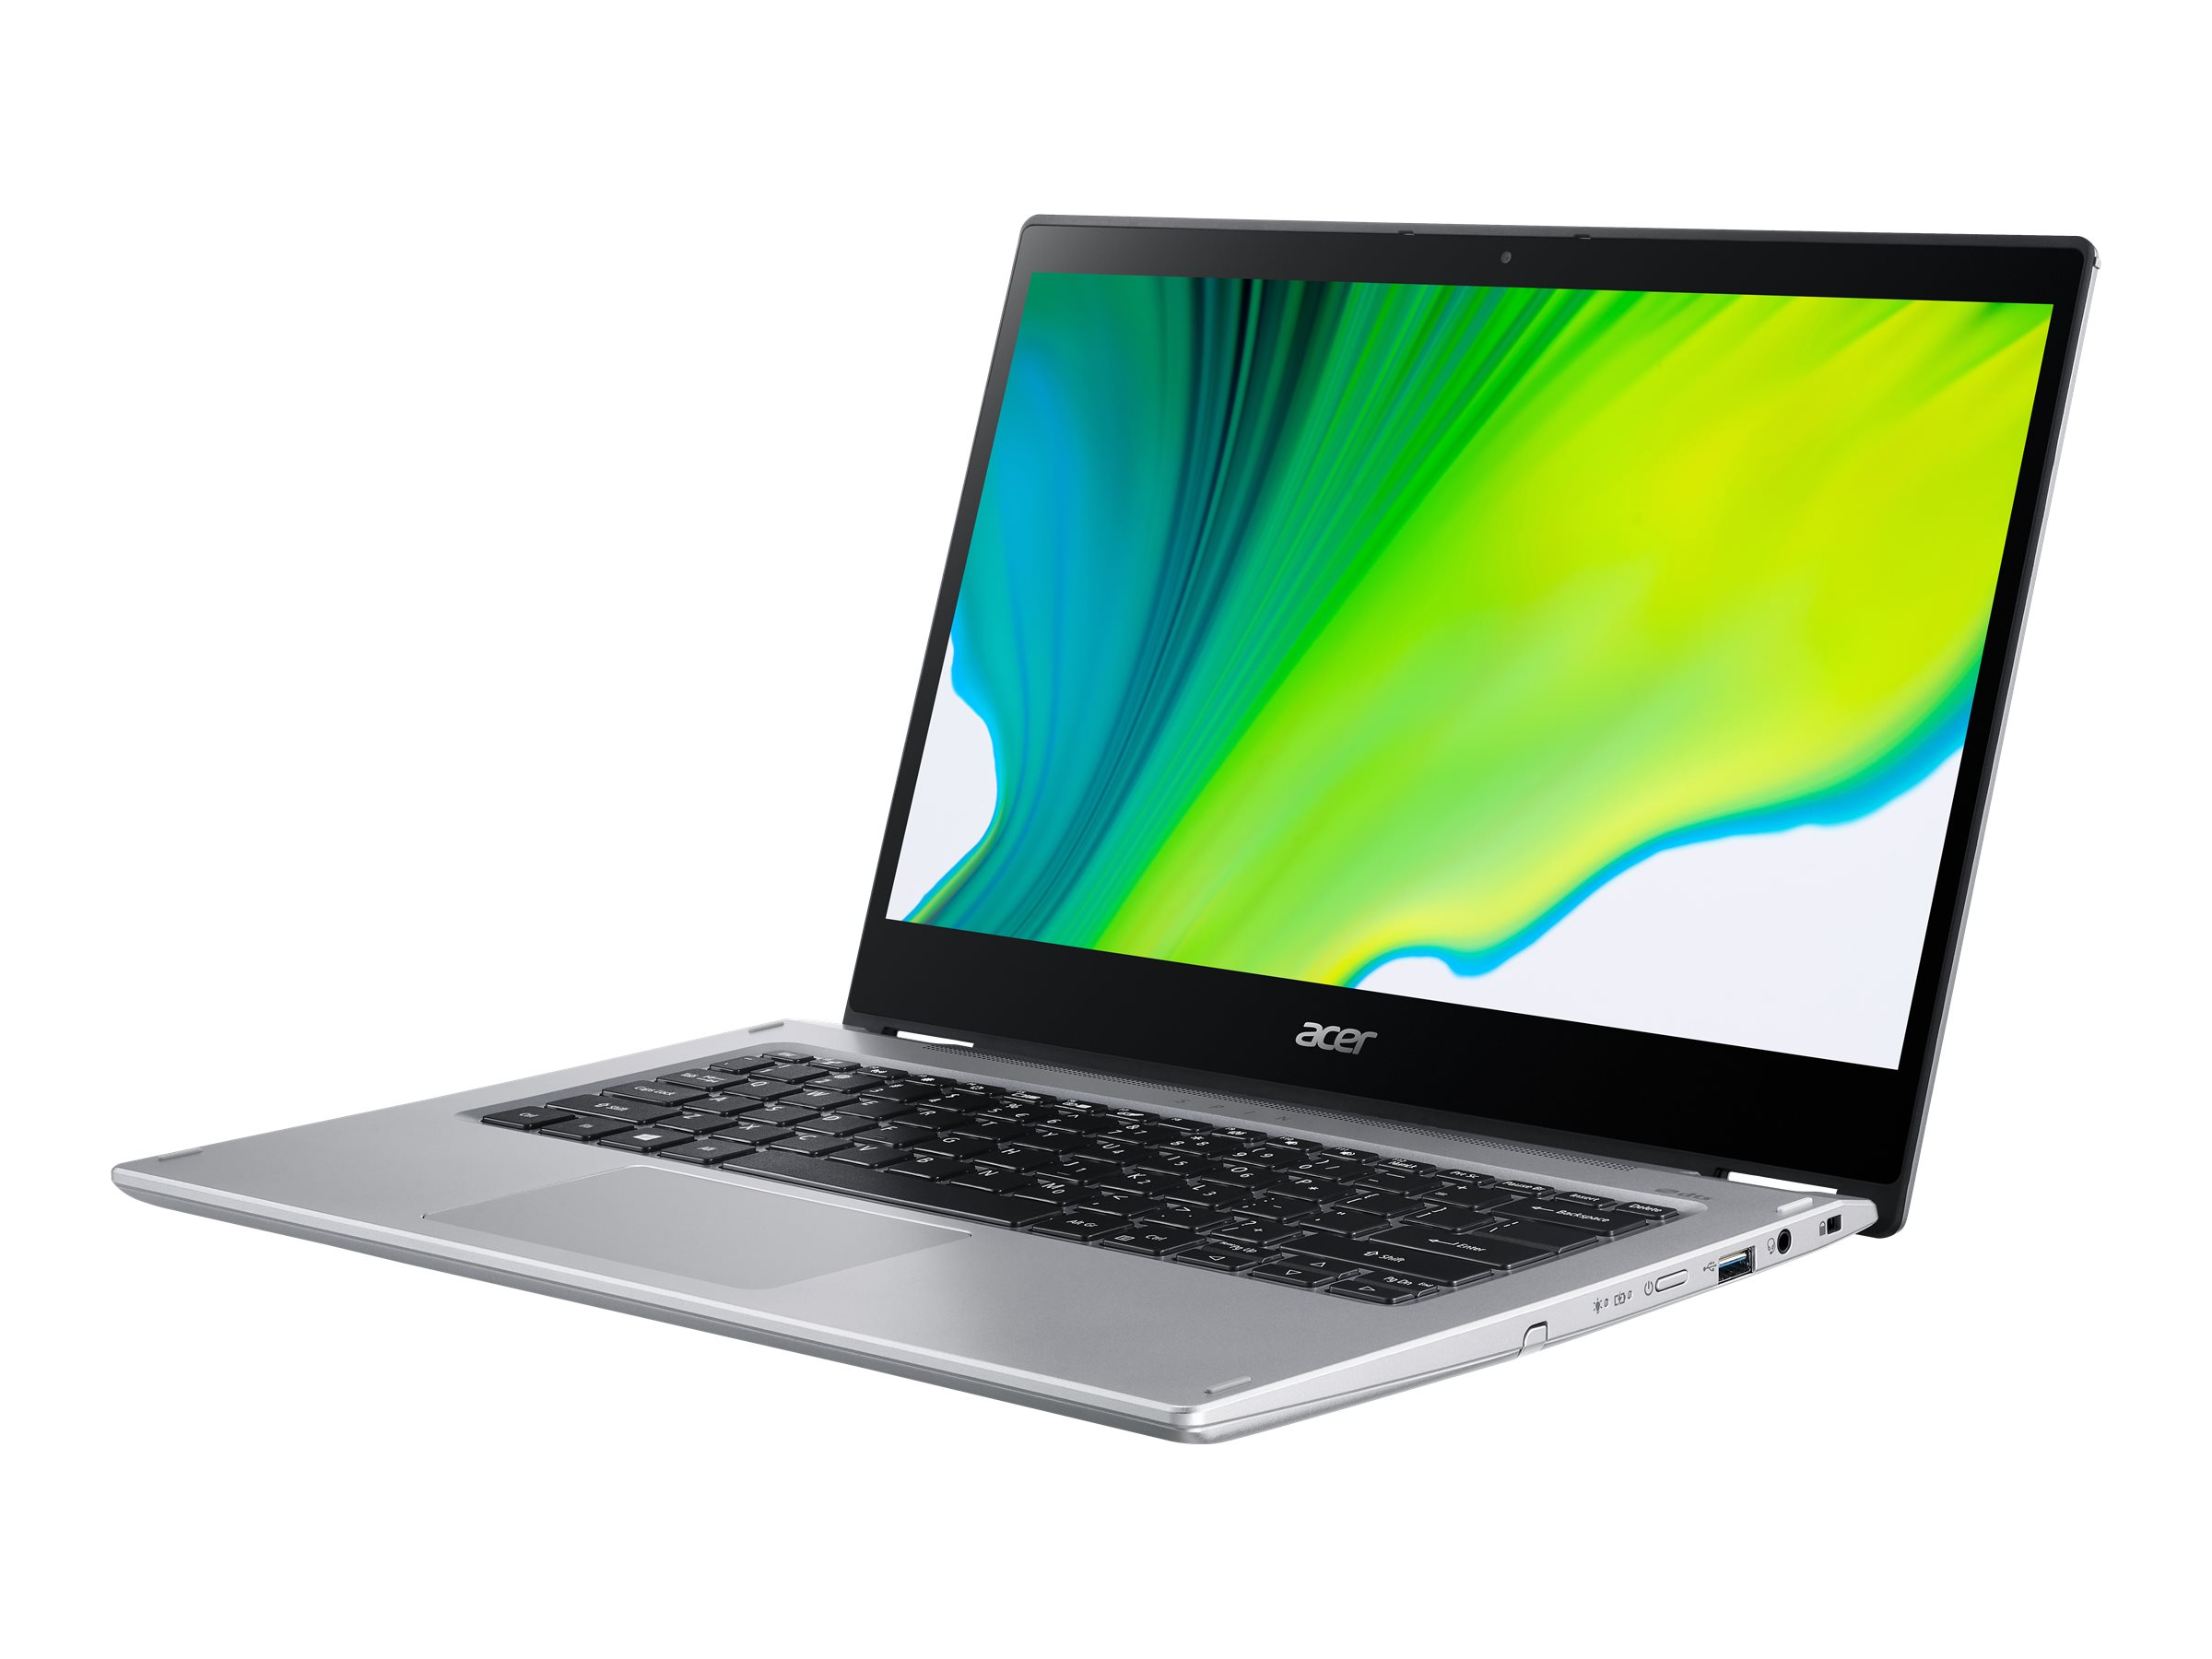 "Acer Spin 3 Pro Series SP314-54N - Flip-Design - Core i5 1035G4 / 1.1 GHz - Win 10 Pro 64-Bit - 8 GB RAM - 256 GB SSD - 35.56 cm (14"")"